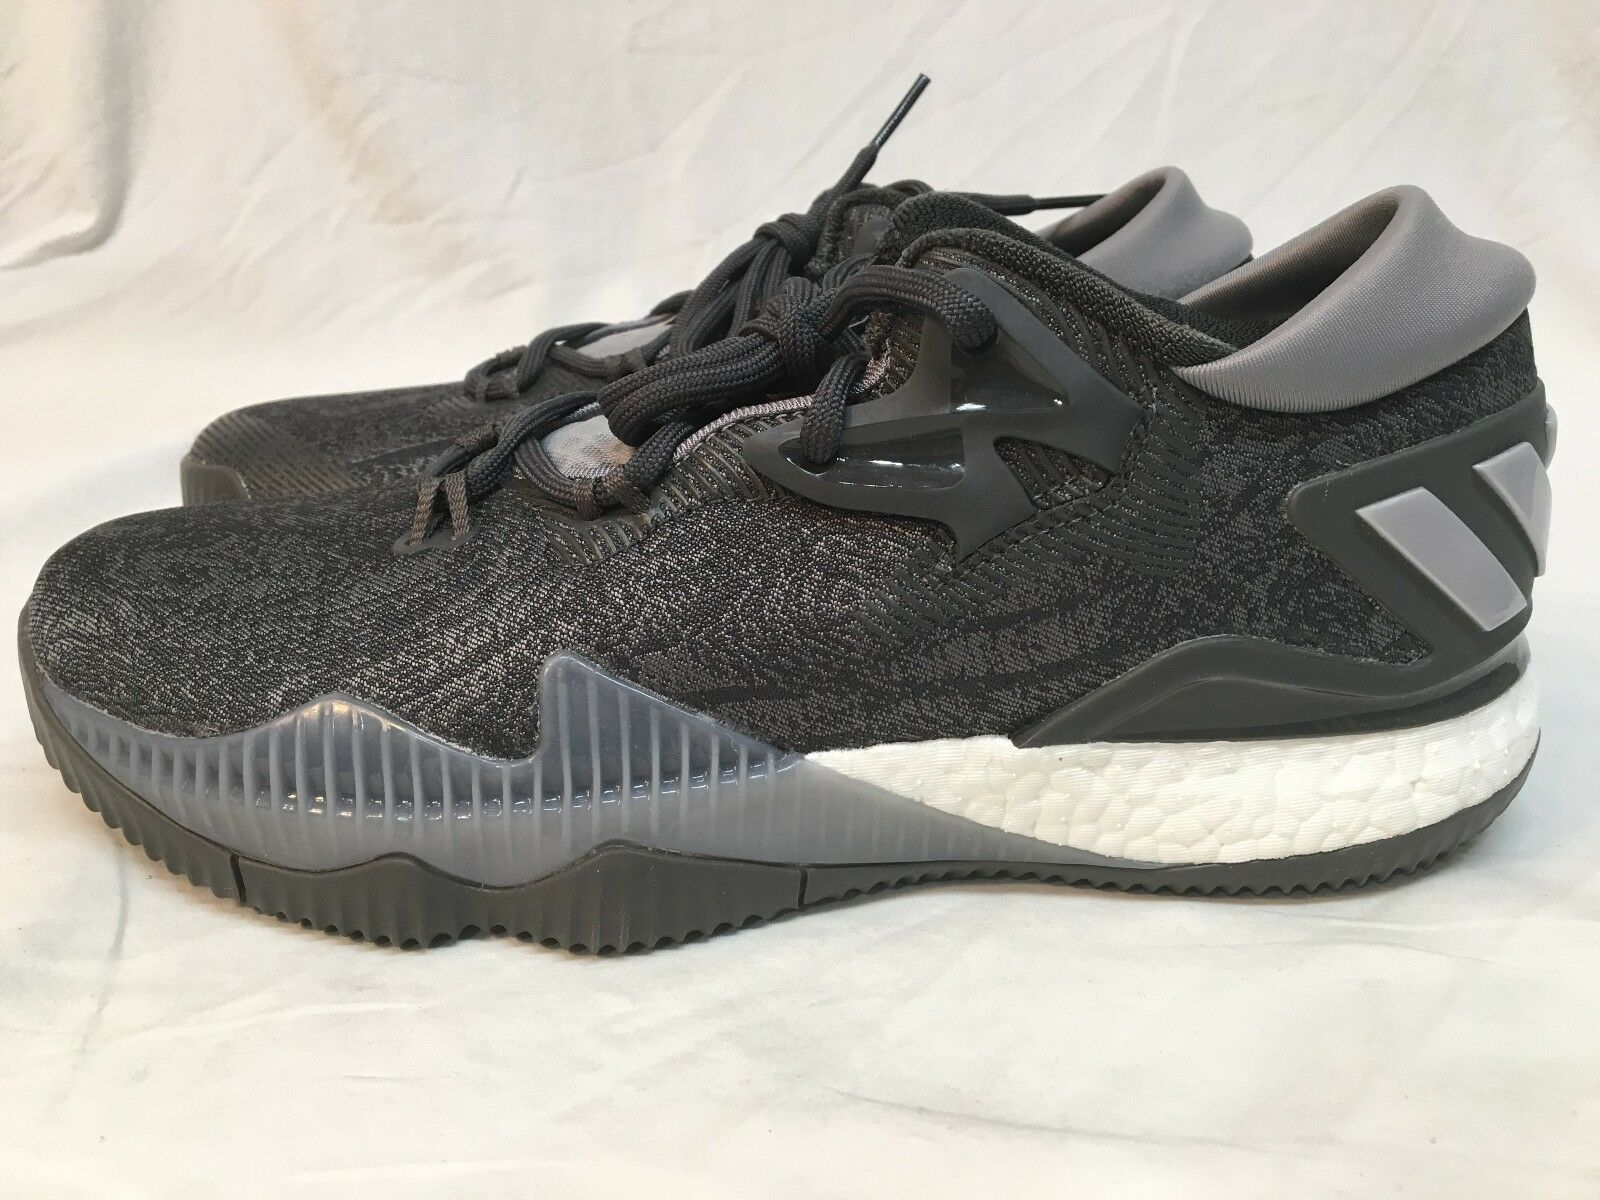 Men's Adidas Crazylight Boost Low - Grey/Black - NIB - Comfortable Seasonal clearance sale